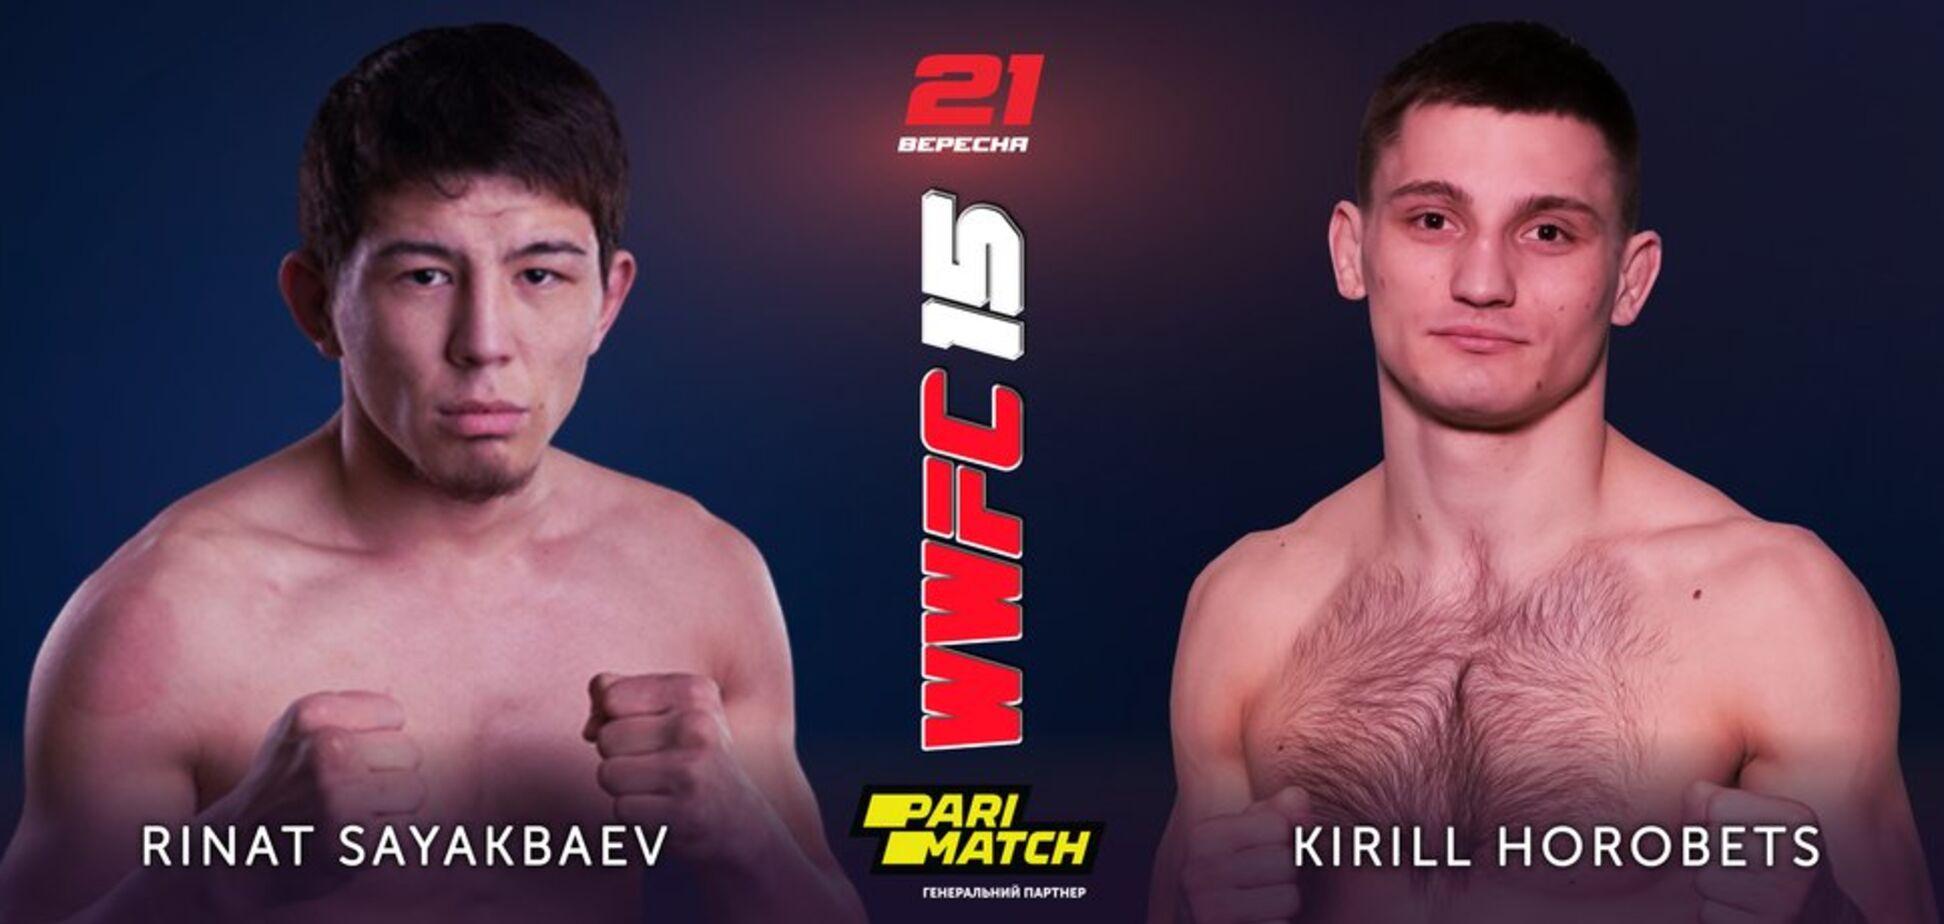 Кирилл Горобец vs Ринат Саякбаев: бой за вакантный титул чемпиона мира WWFC в весе до 70,3 кг